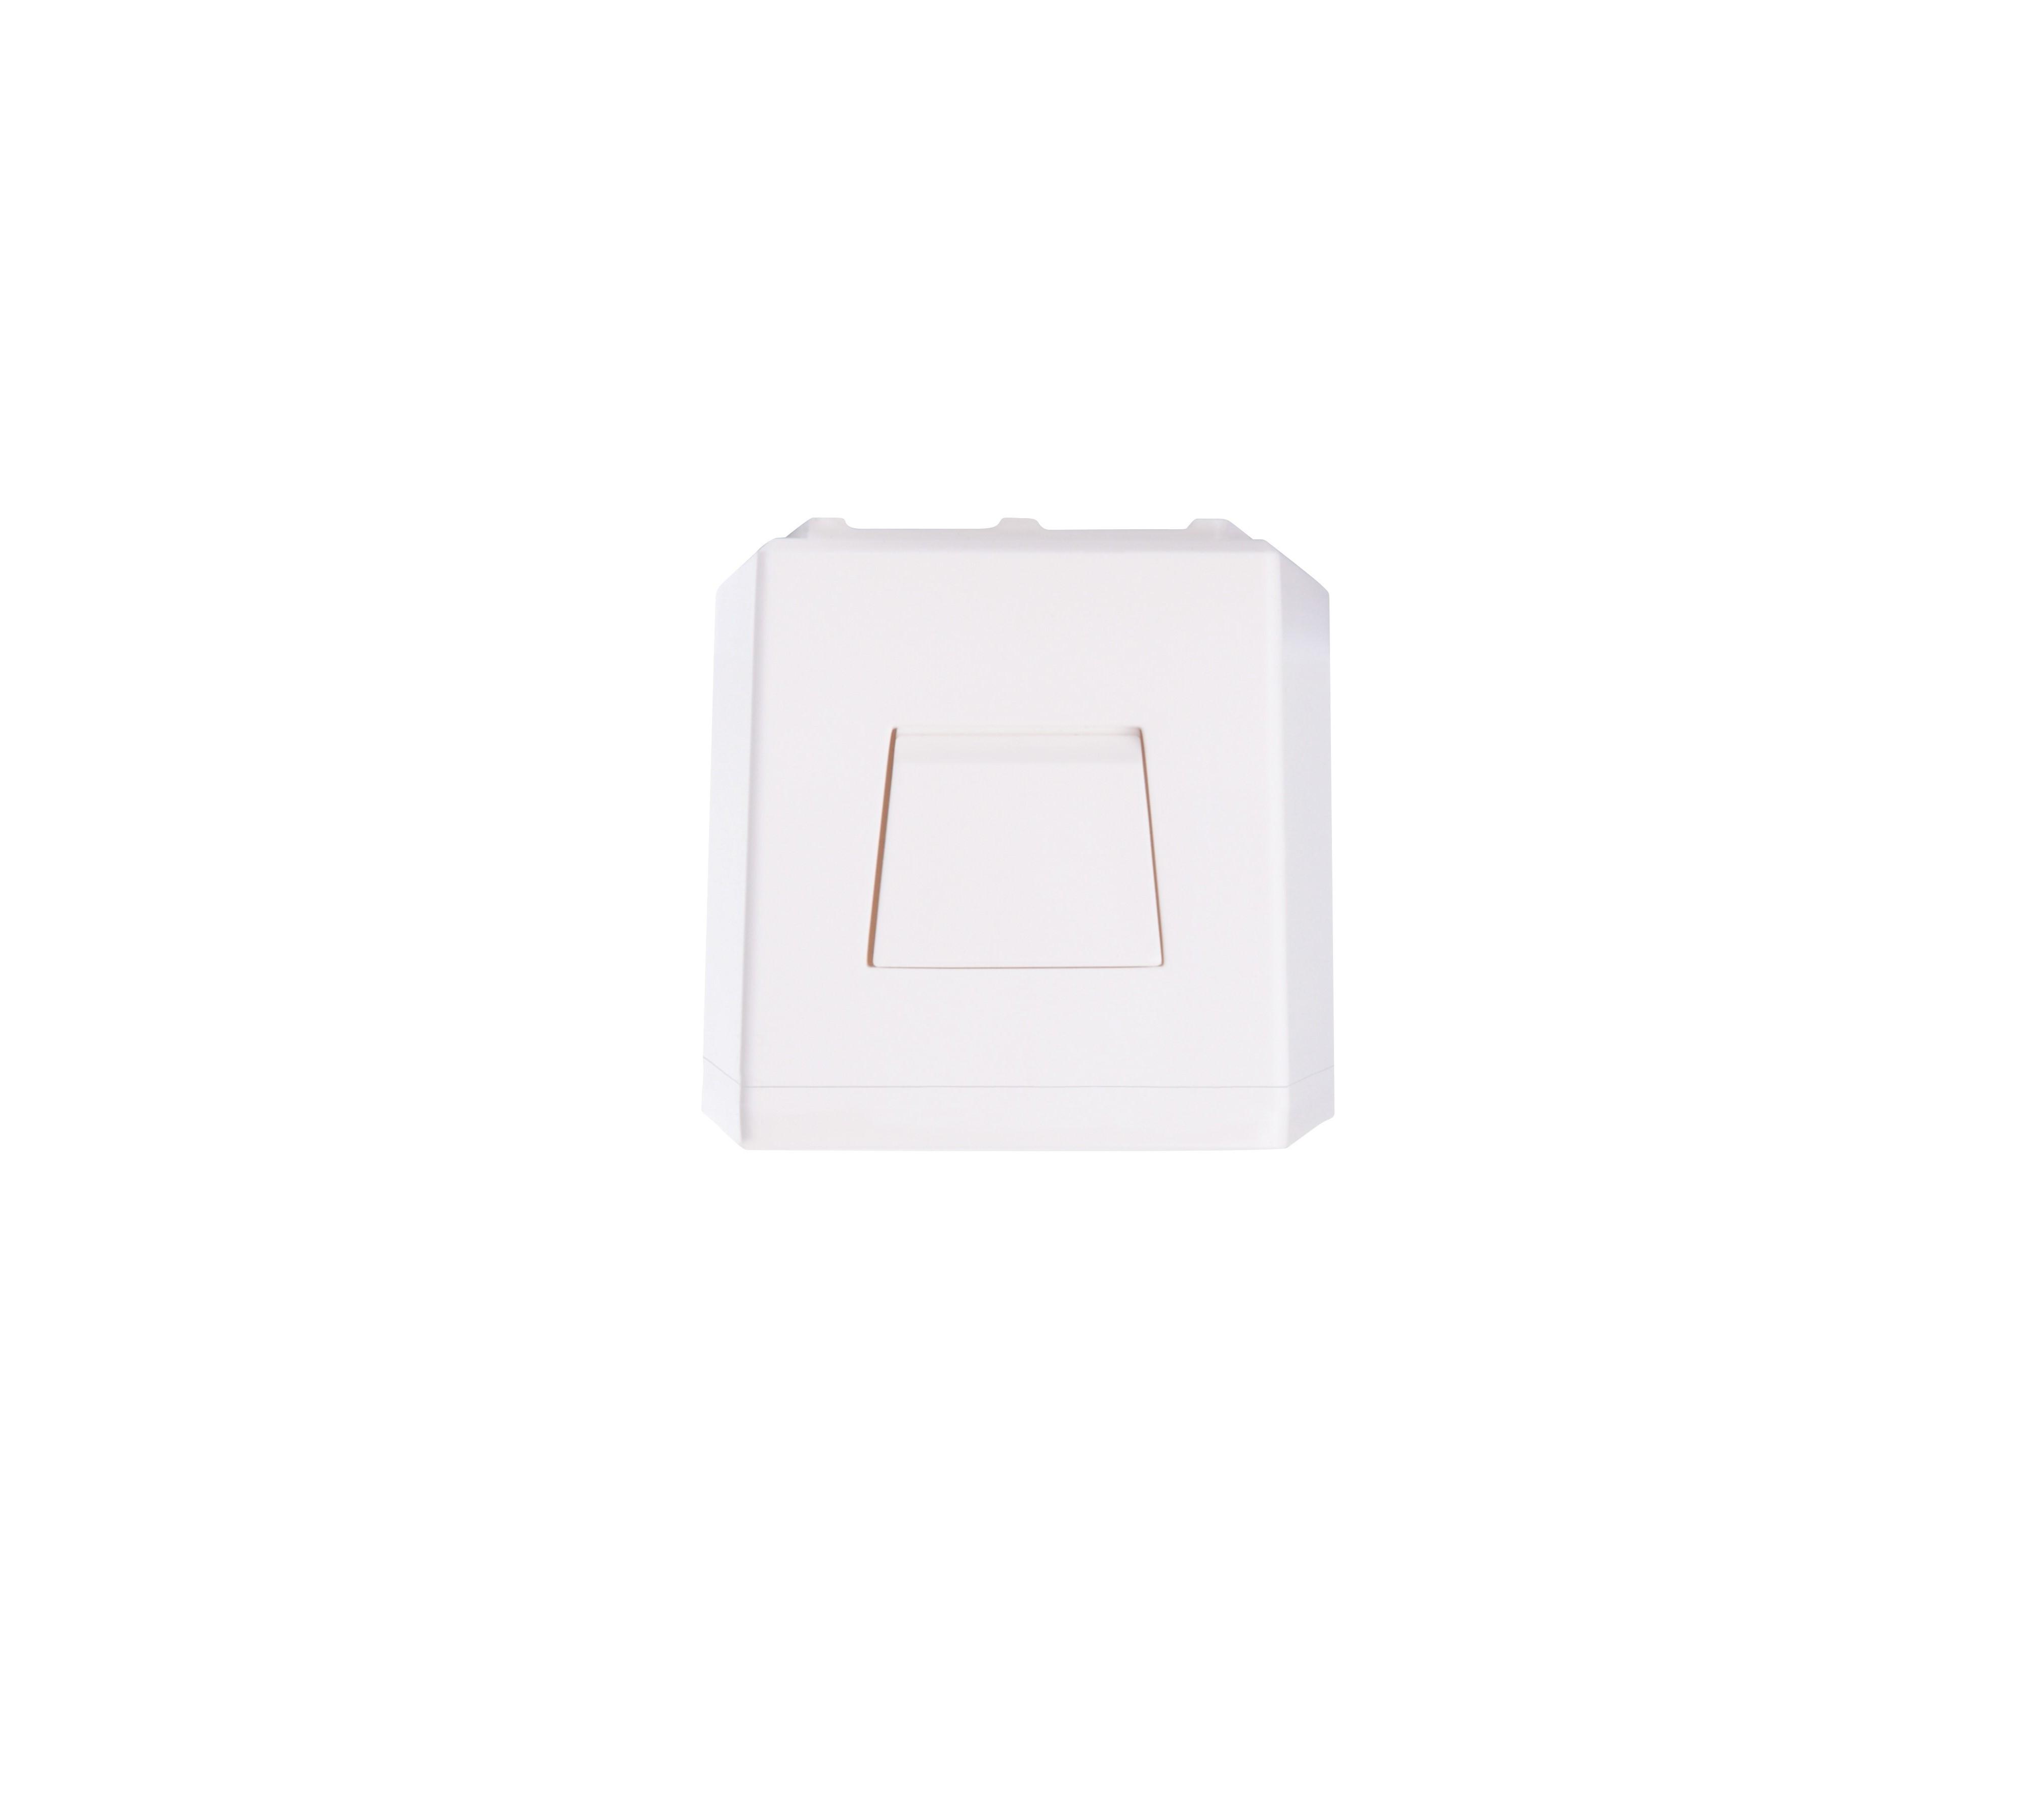 Lampa emergenta led Intelight 94554   3h mentinut test automat 1